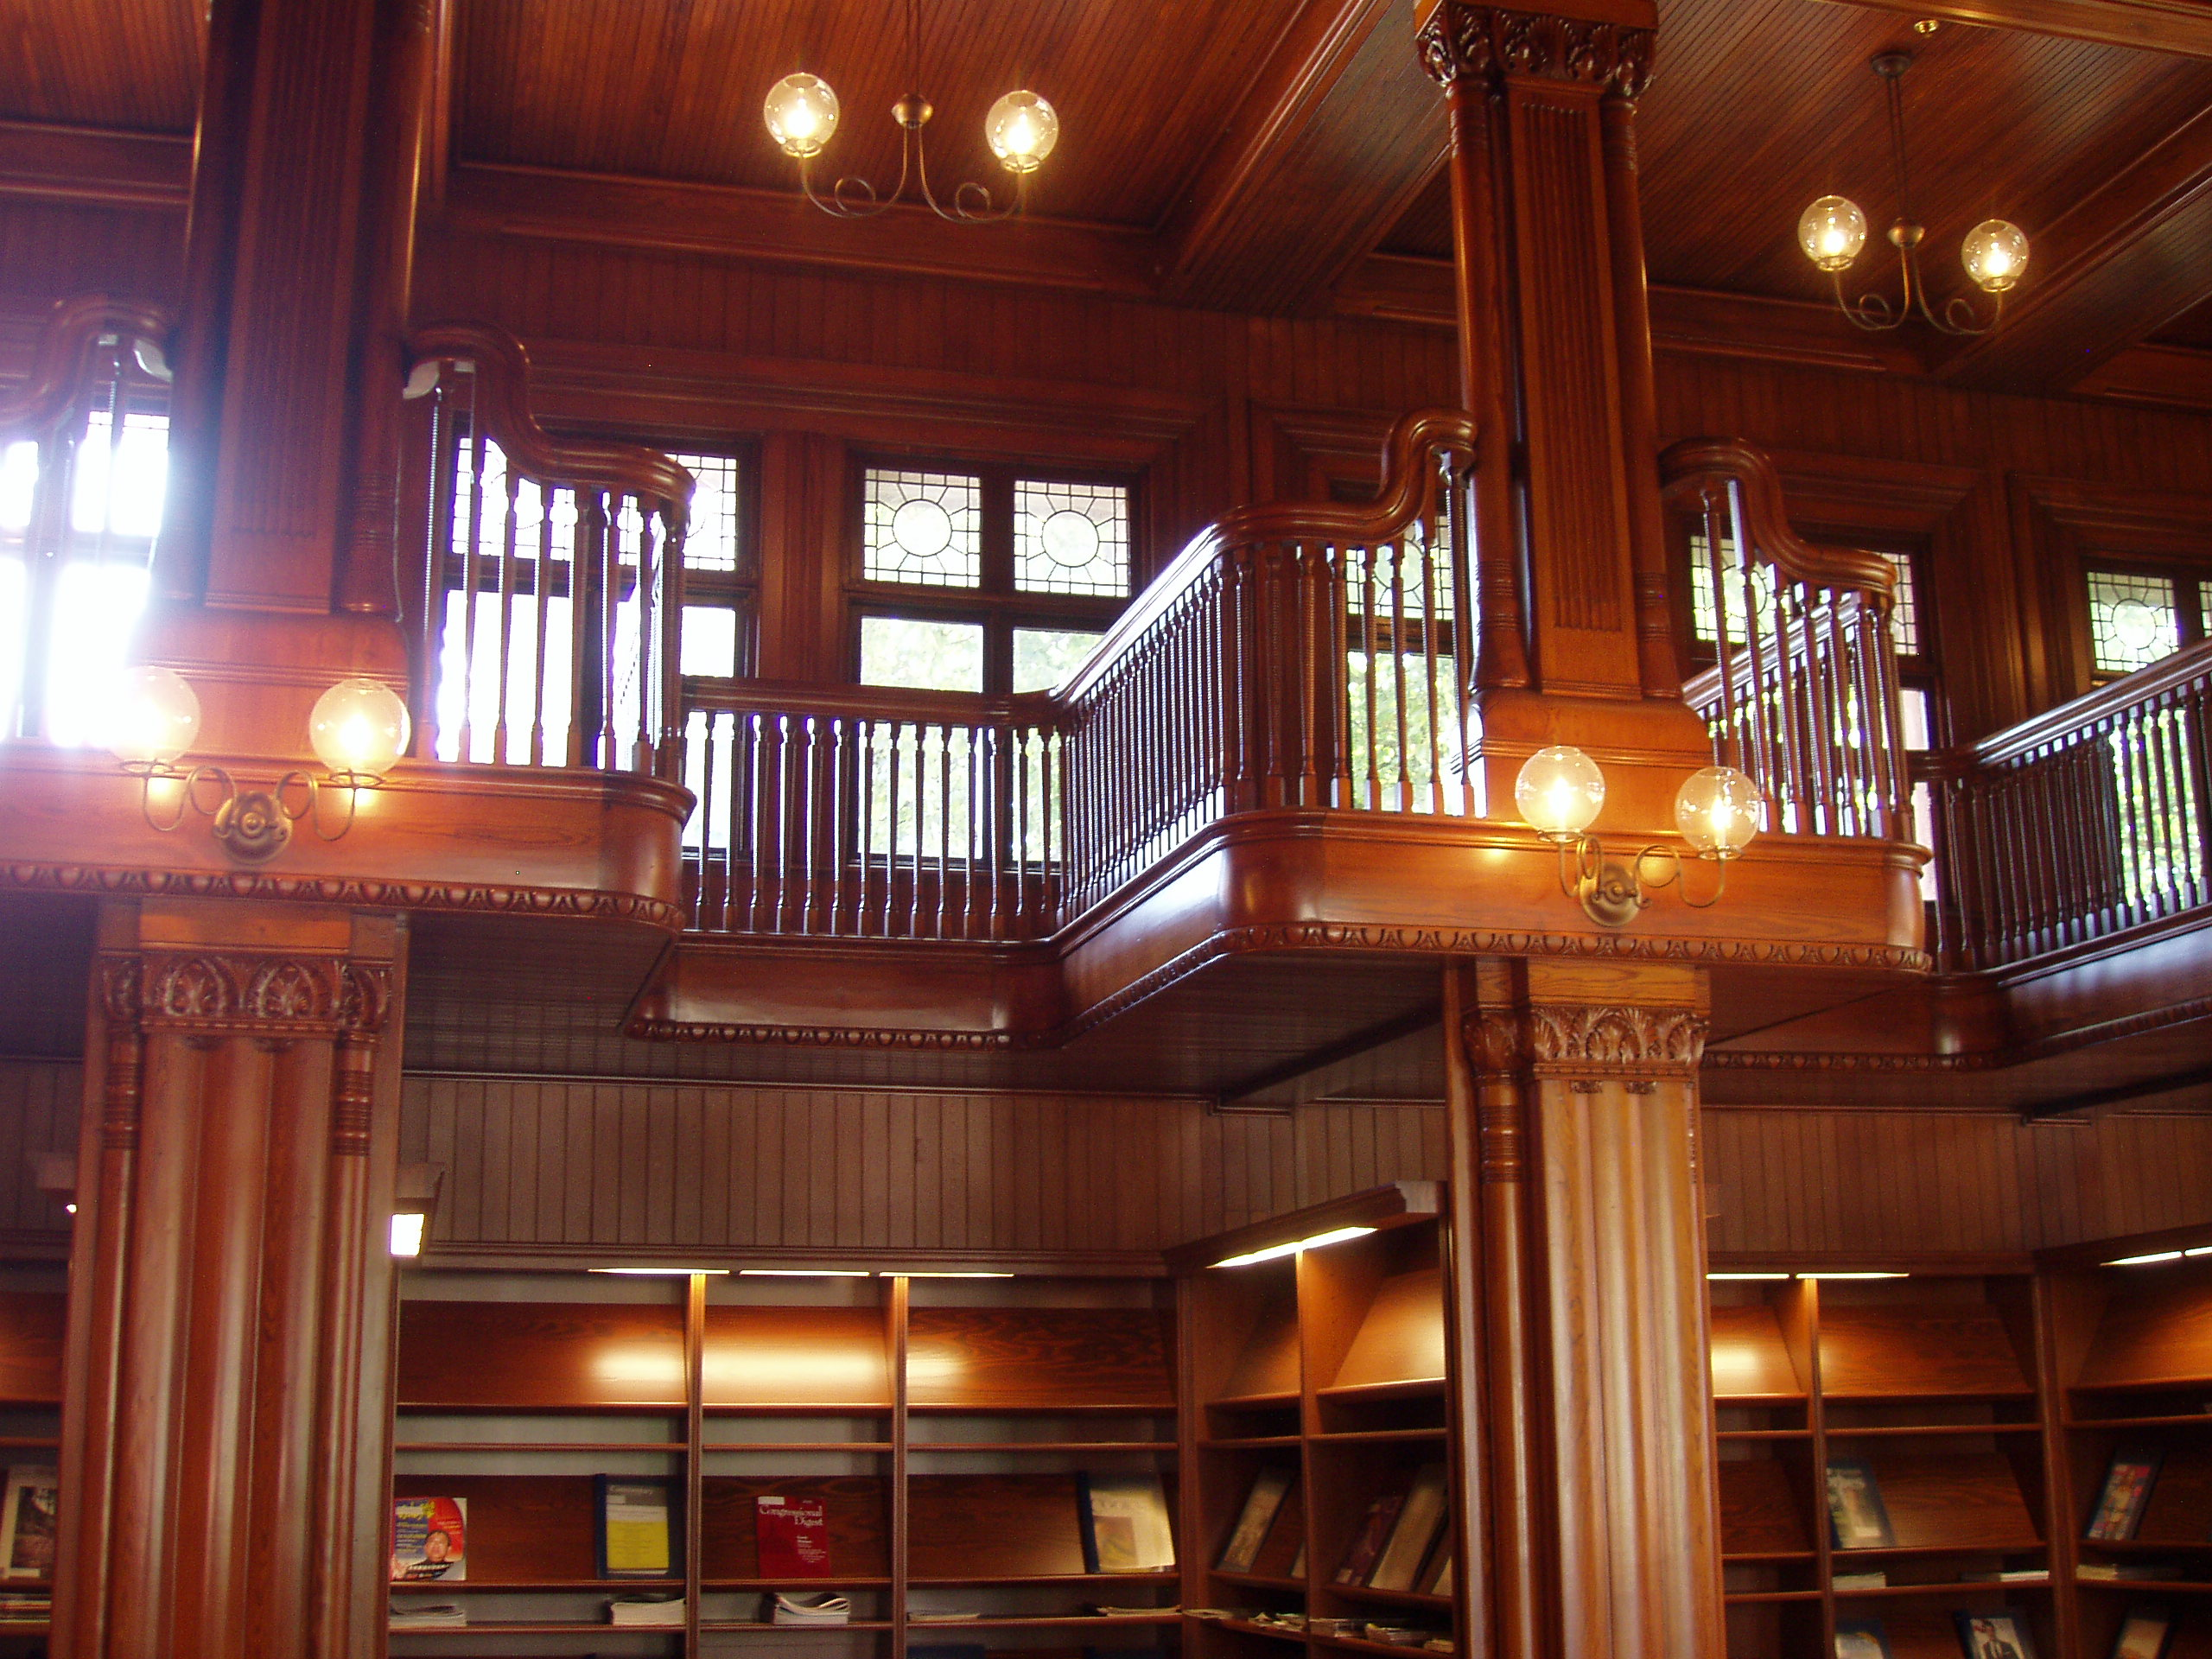 FileThomas Crane Public Library Quincy Massachusetts